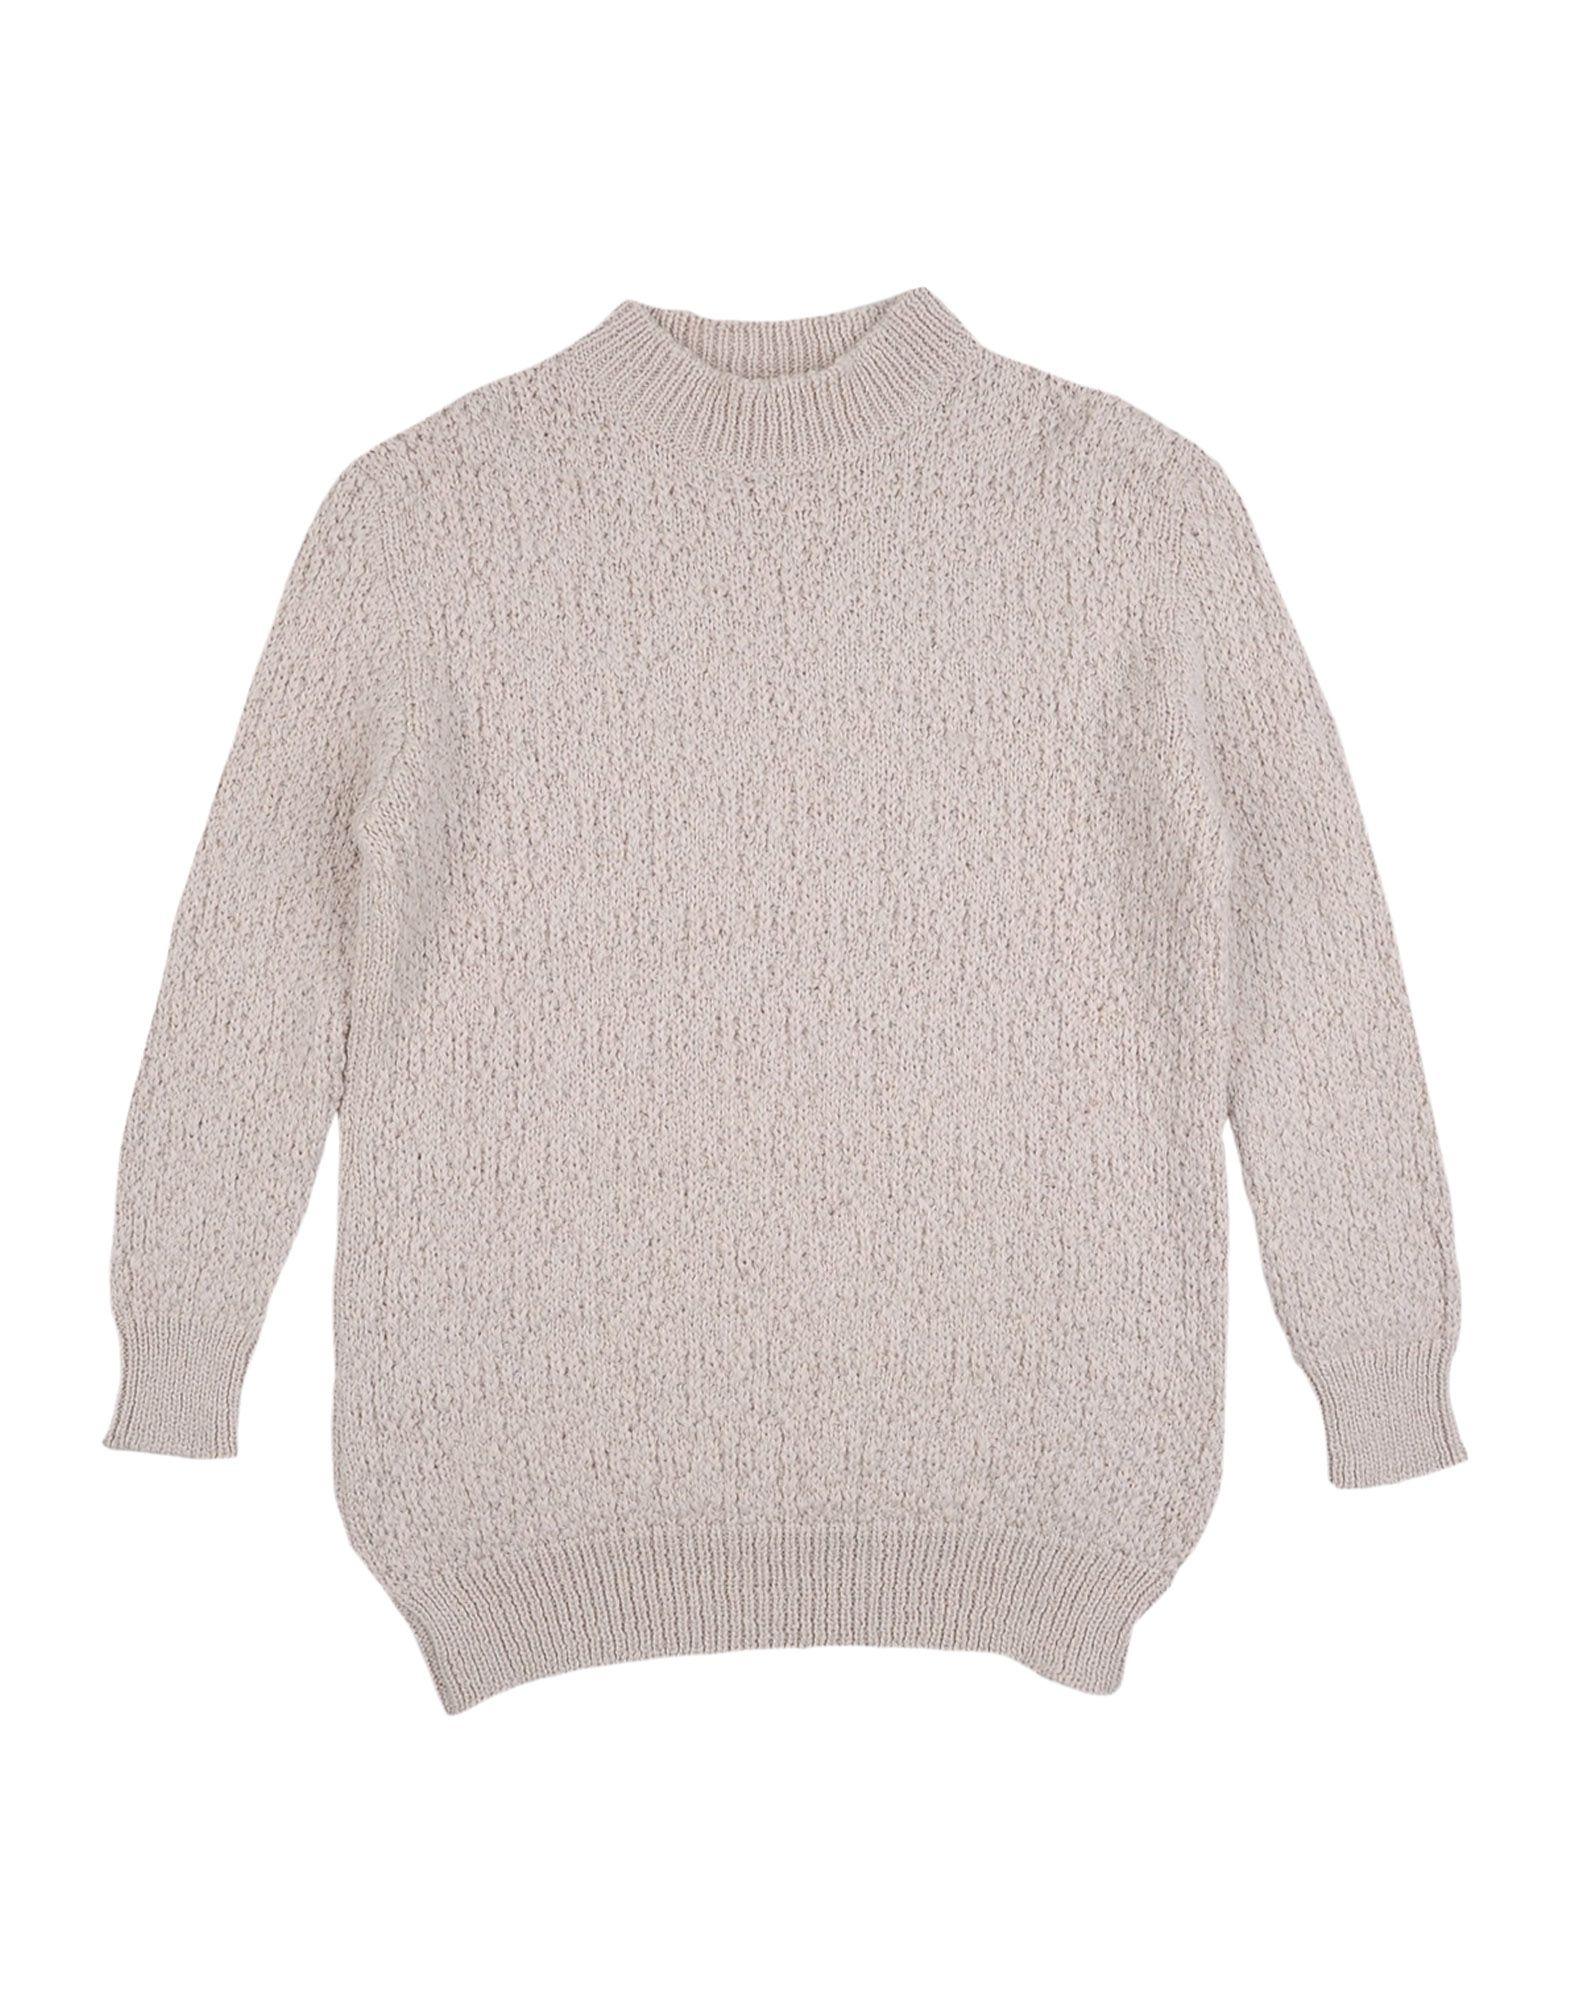 CAFFE D'ORZO | CAFFÉ D'ORZO Sweaters | Goxip